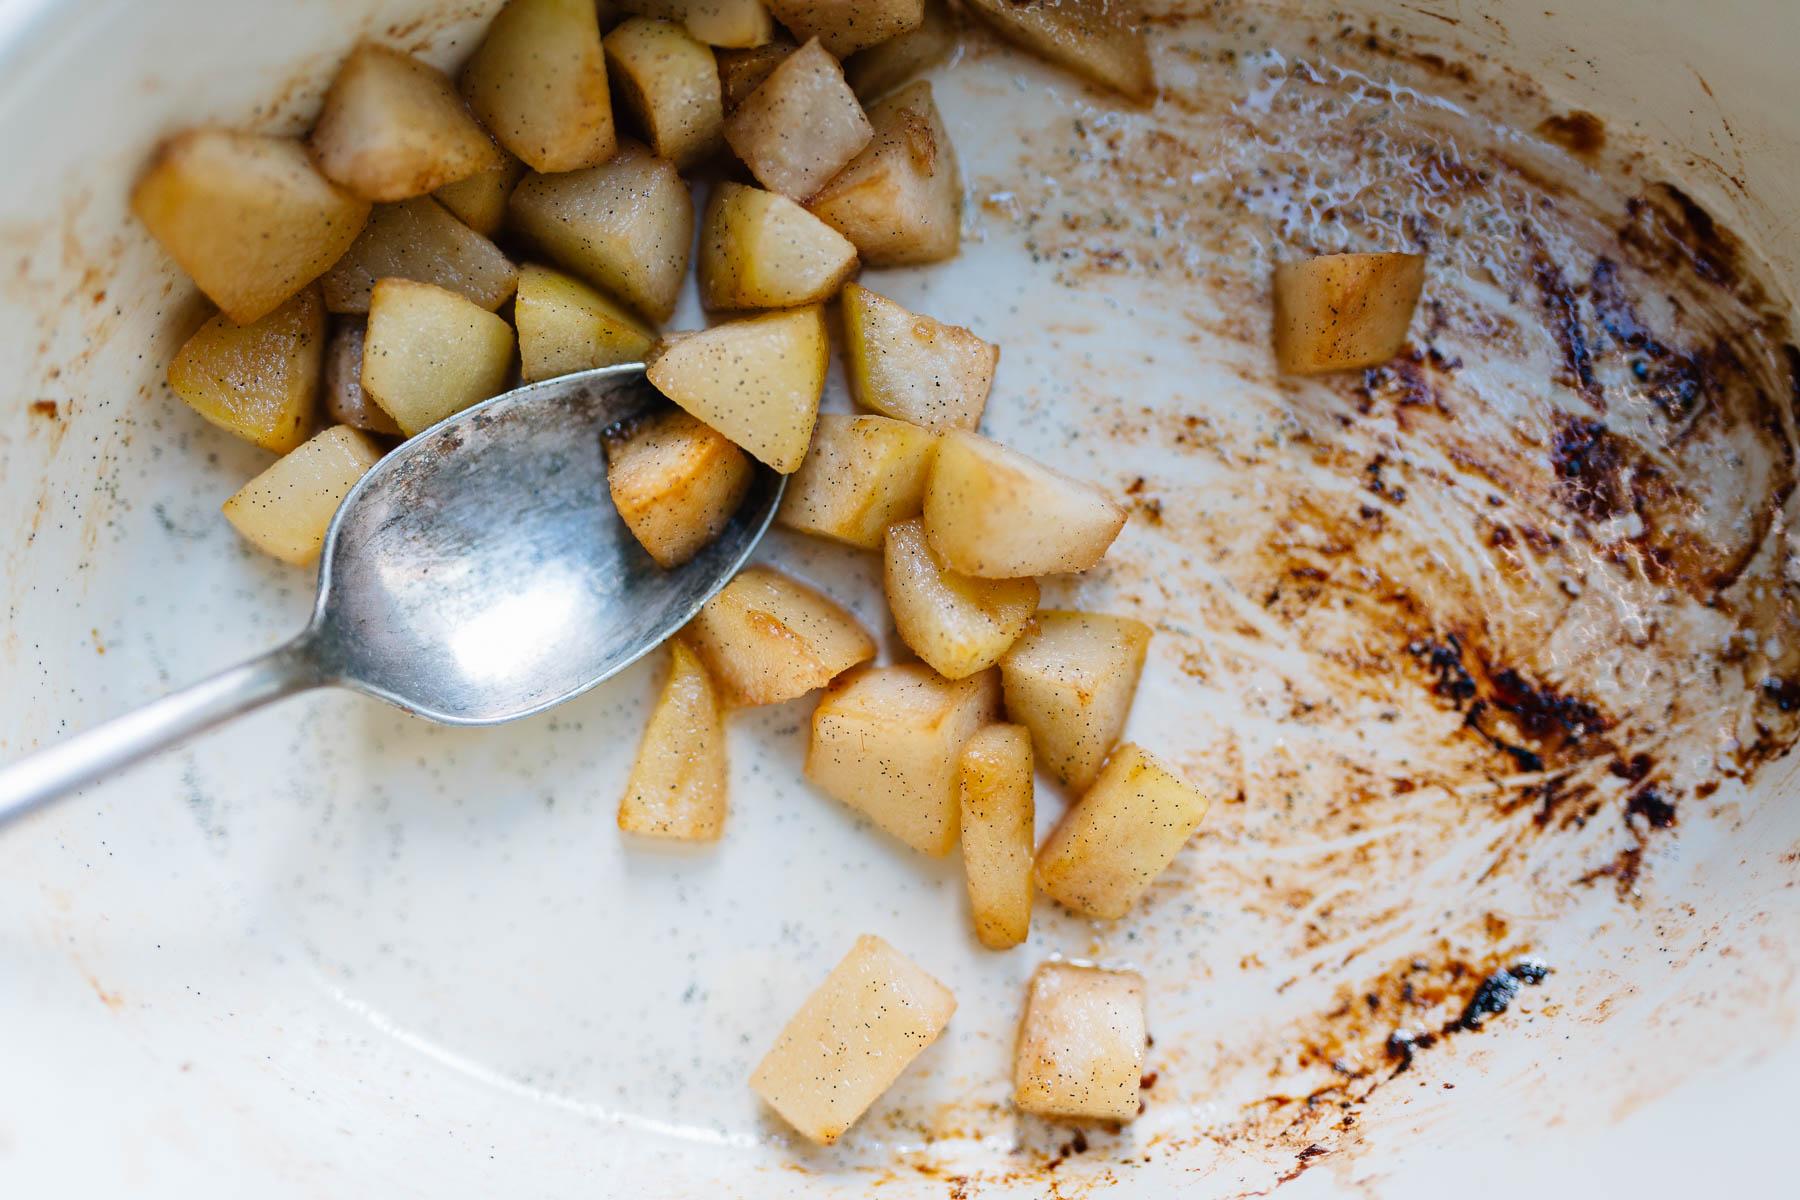 chicago-nyc-food-lifestyle-photographer-26.jpg